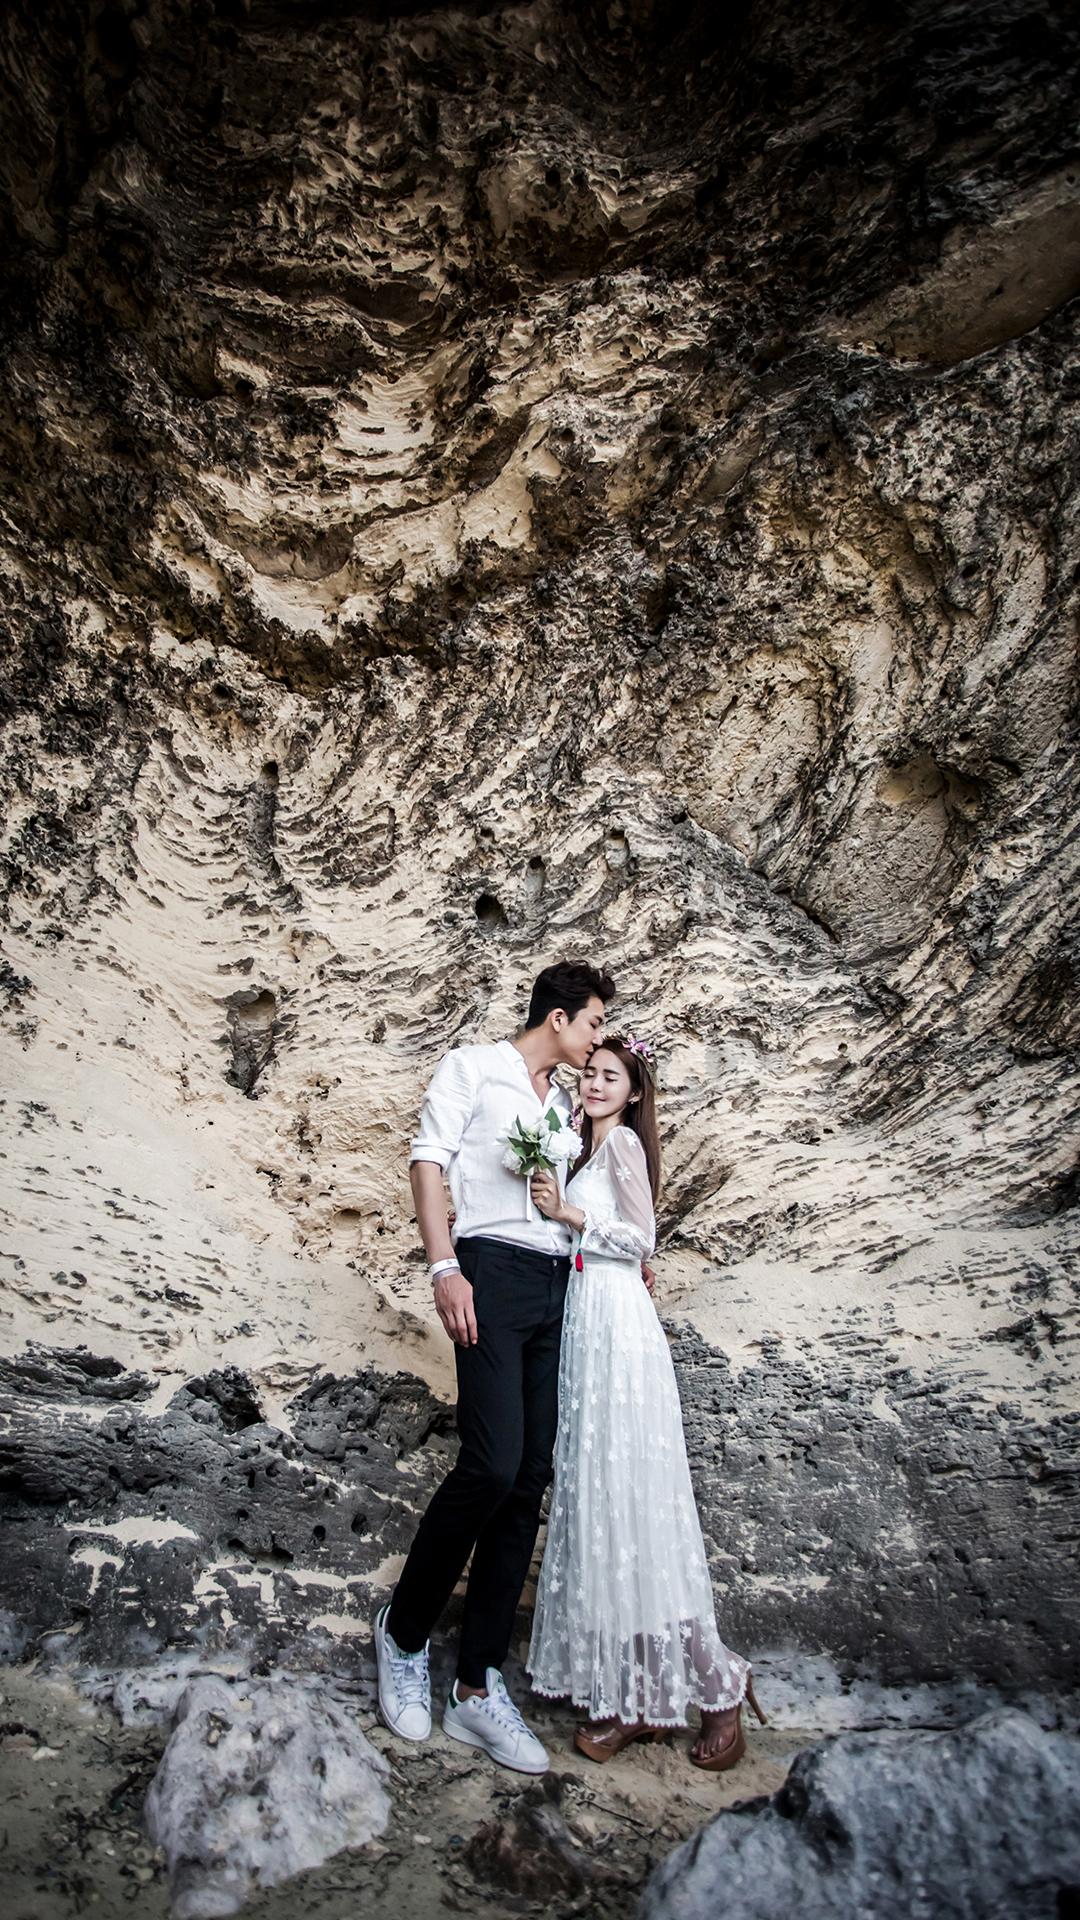 Sprazzi_Professional_Photography_Photographer_Cancun_Mexico_LewisTommy_Original_33.jpg